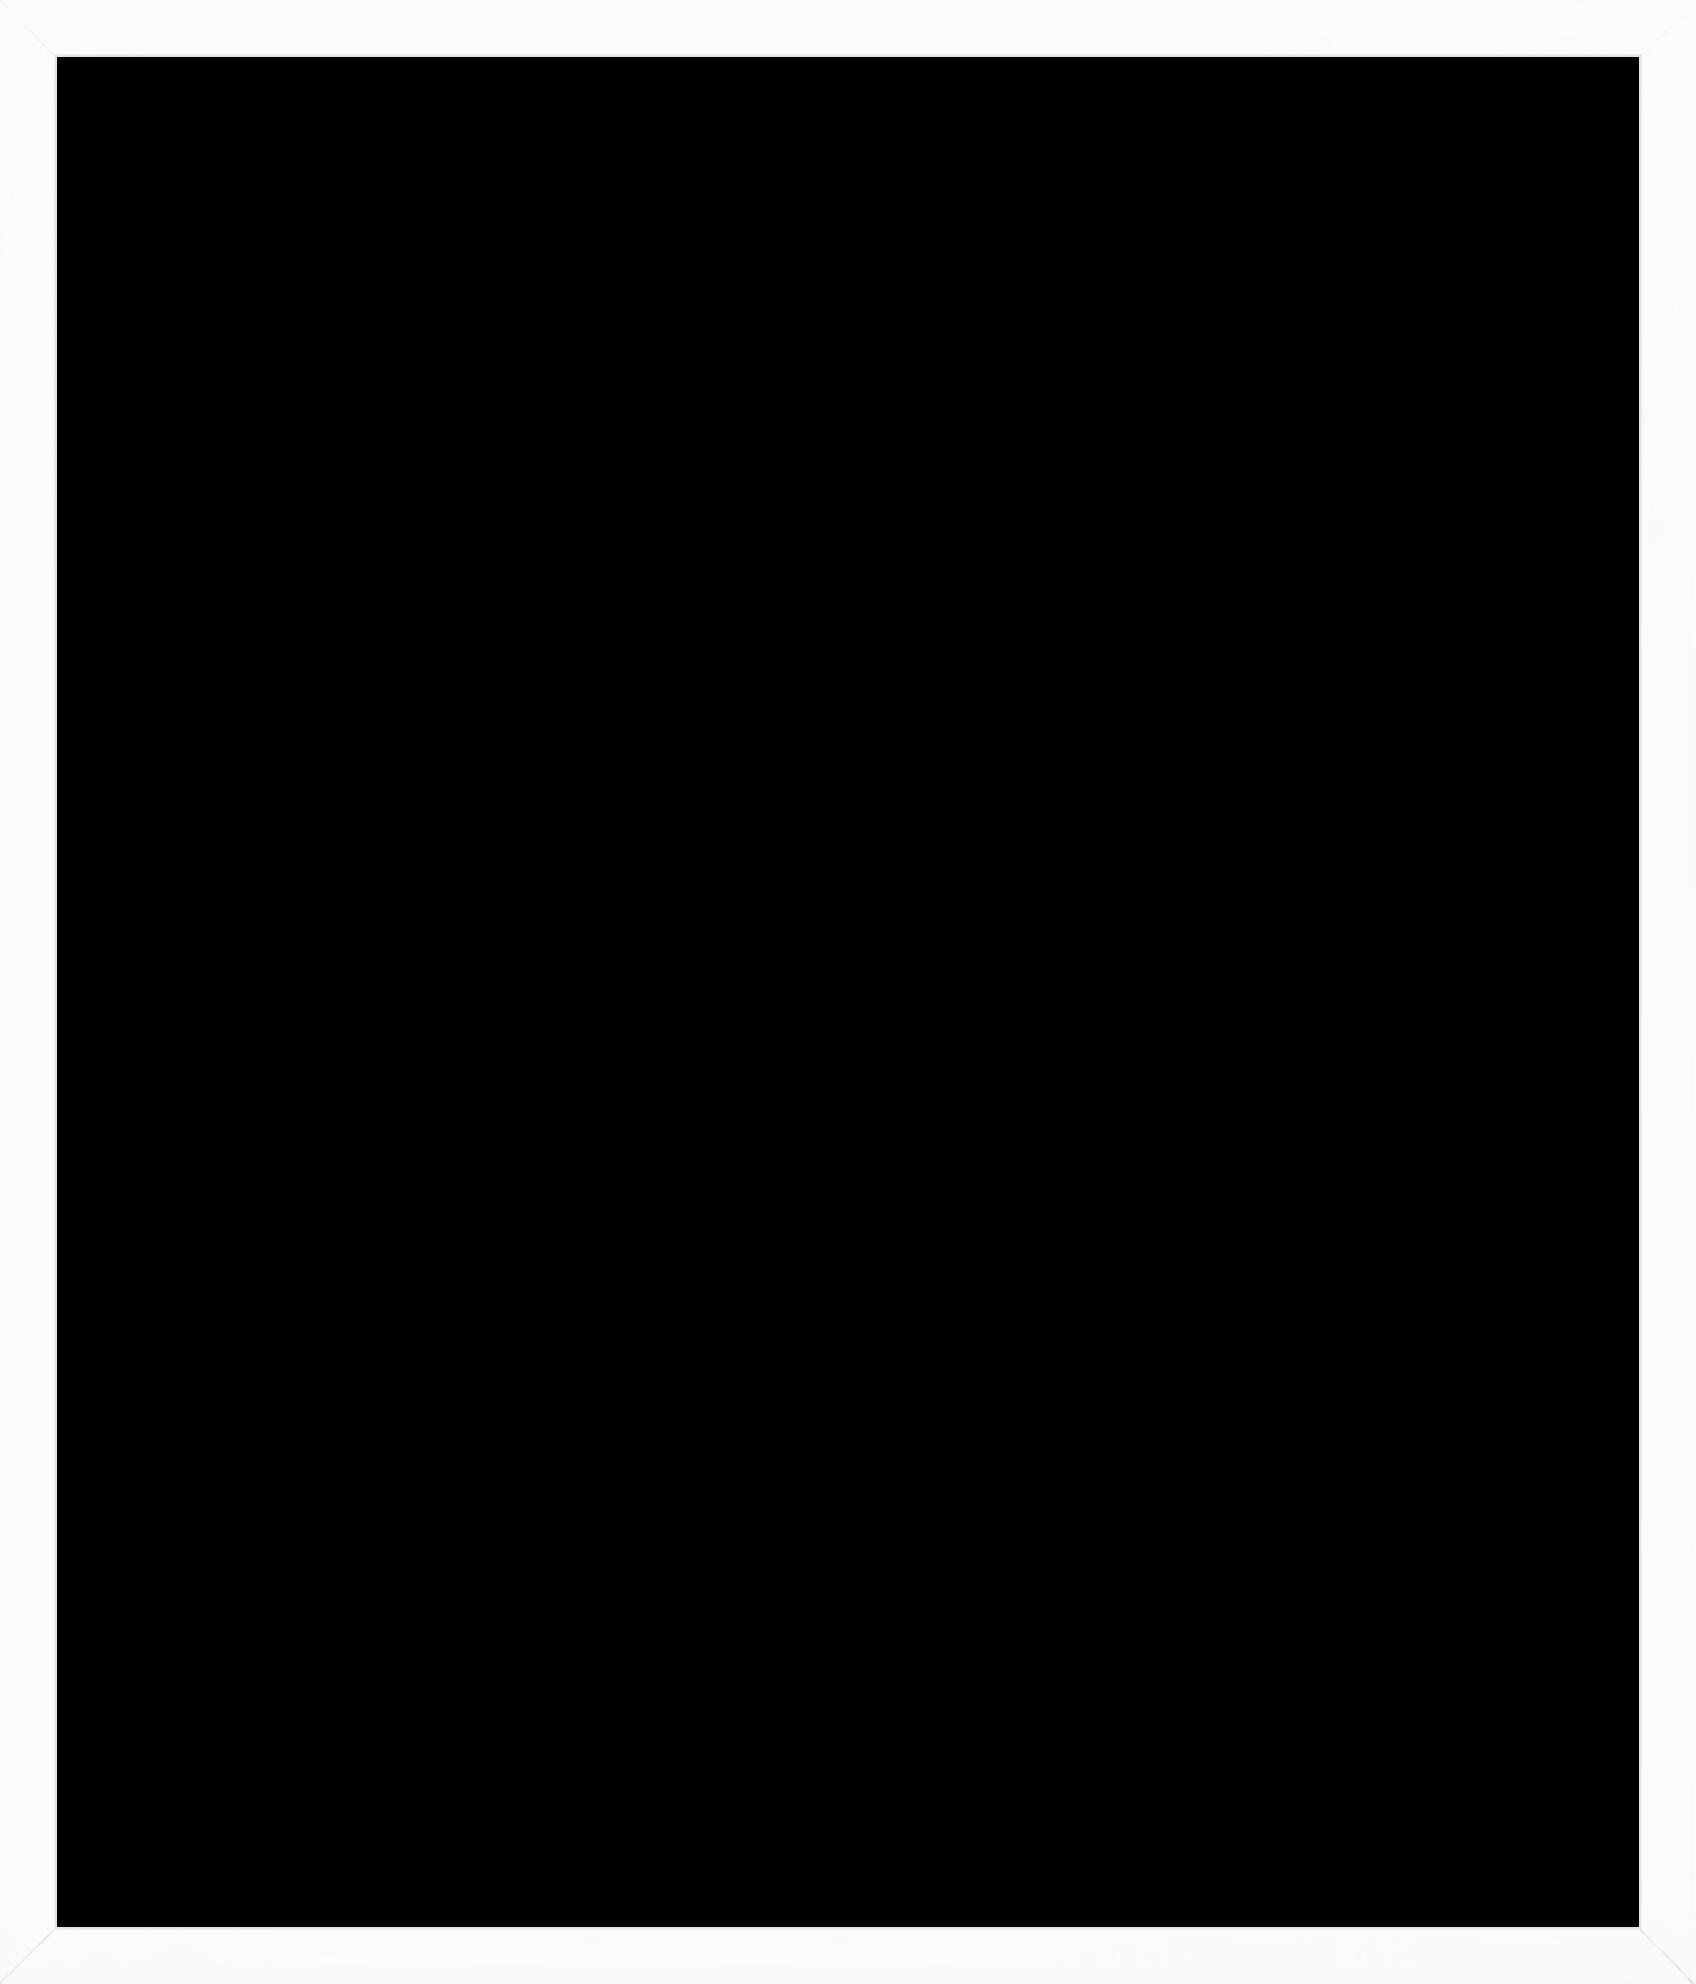 809-1426661623